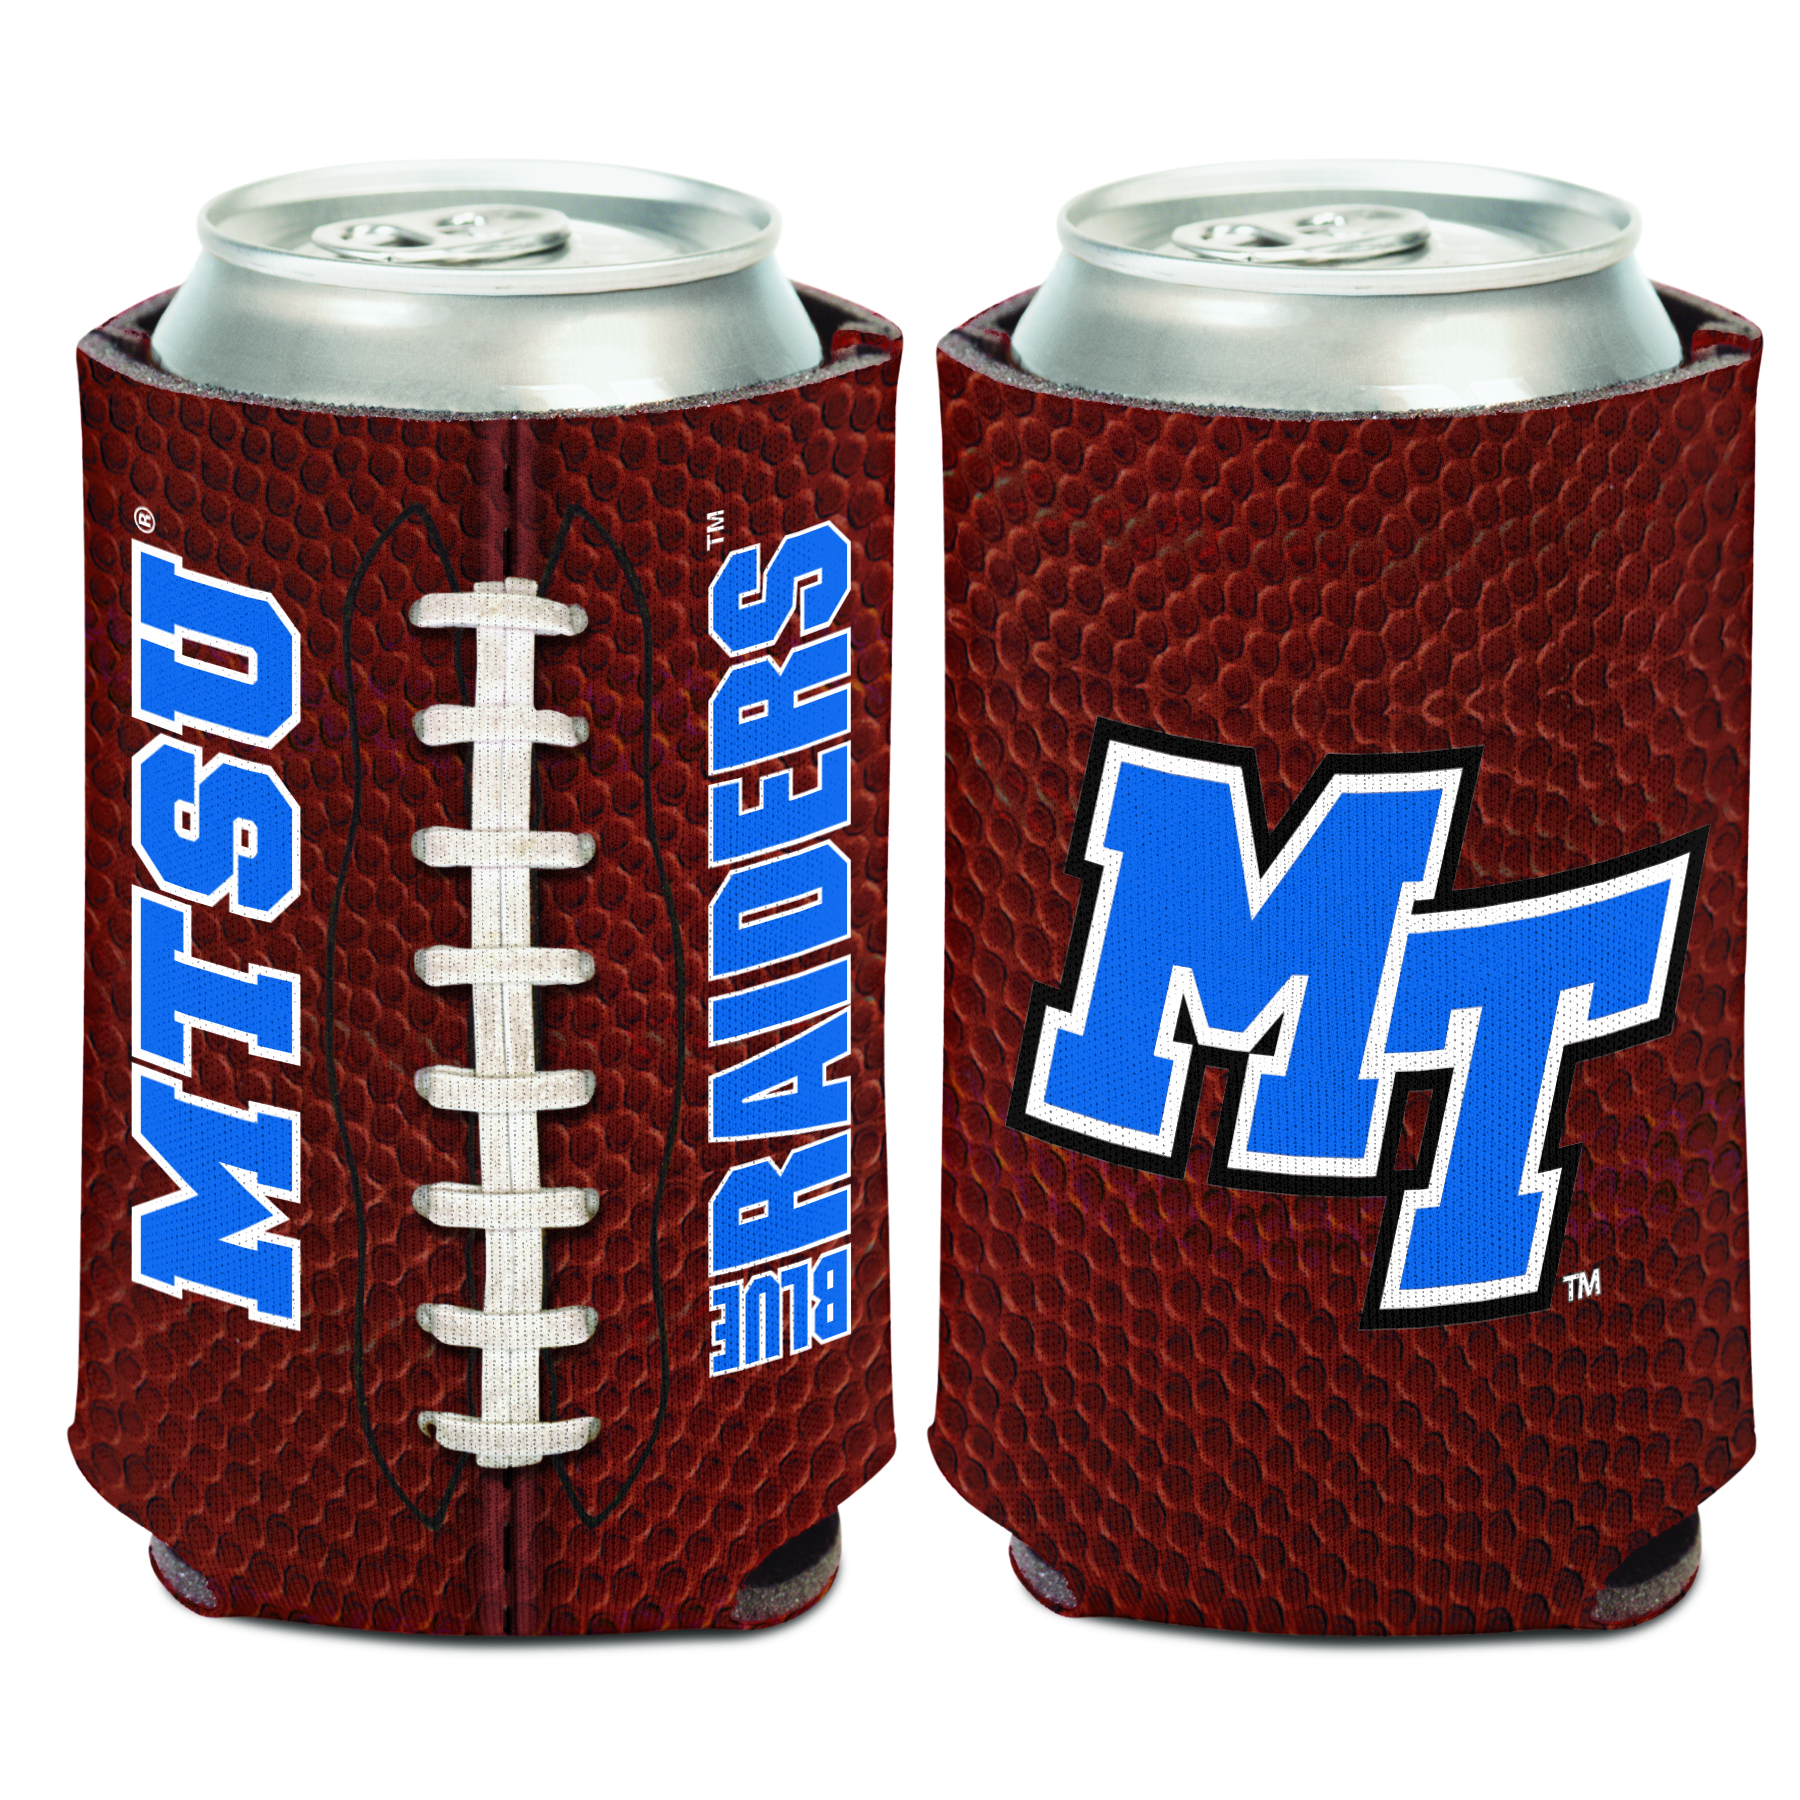 MTSU Blue Raiders Football Coozie